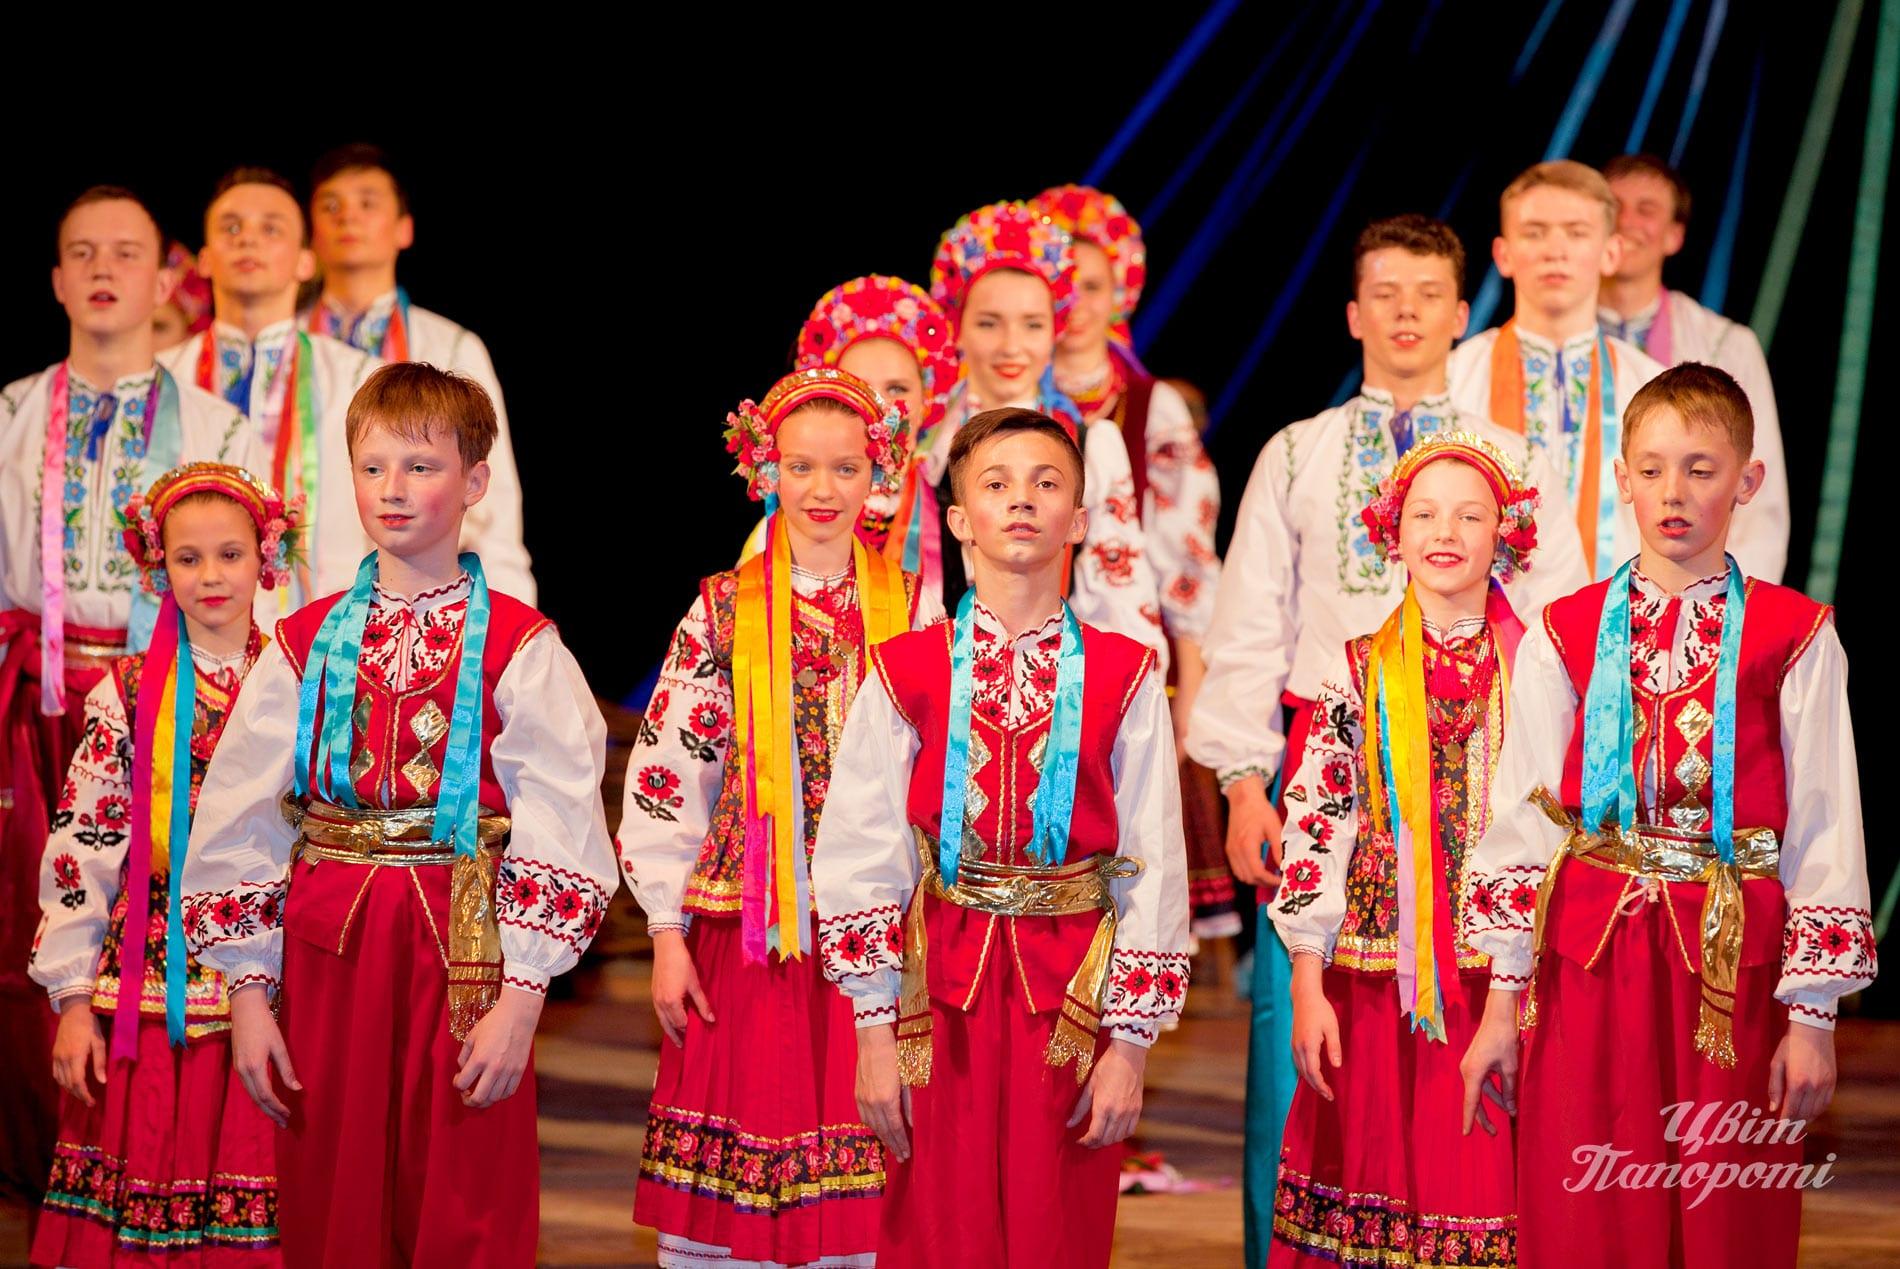 Photo TsvitPaporoti-20-let_2094